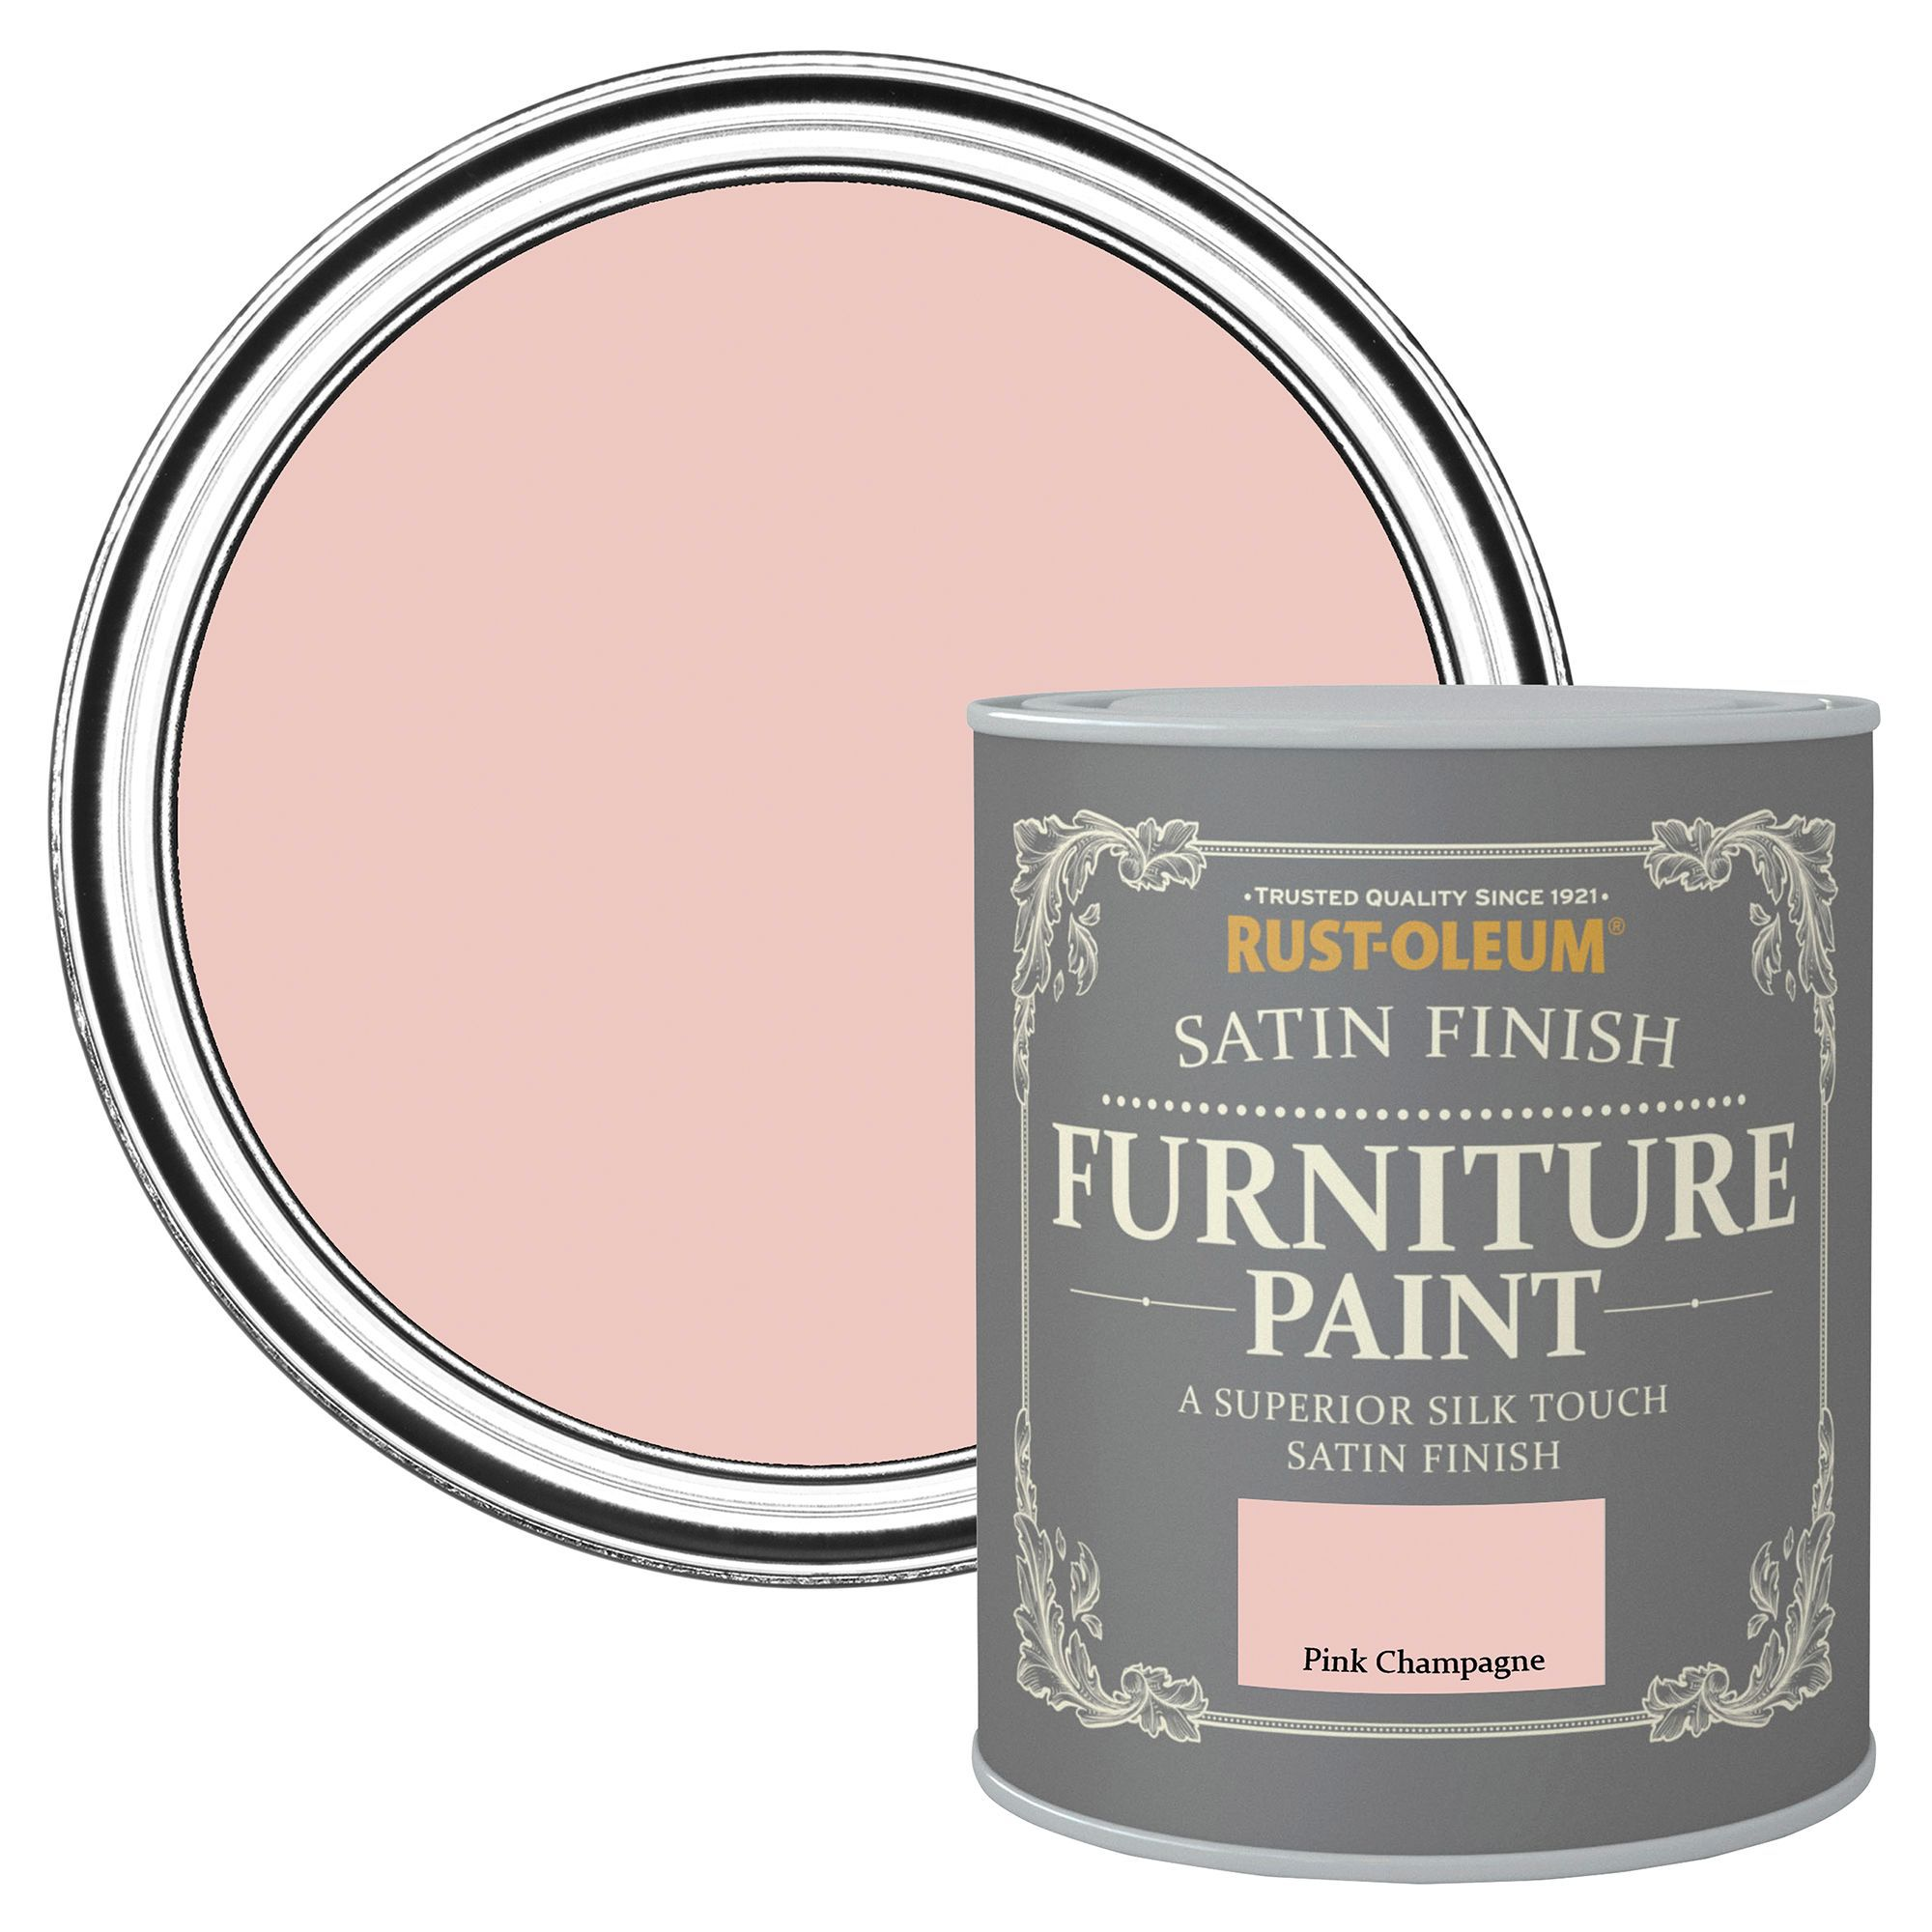 Rust oleum rust oleum pink champagne satin furniture paint - What is satin paint ...